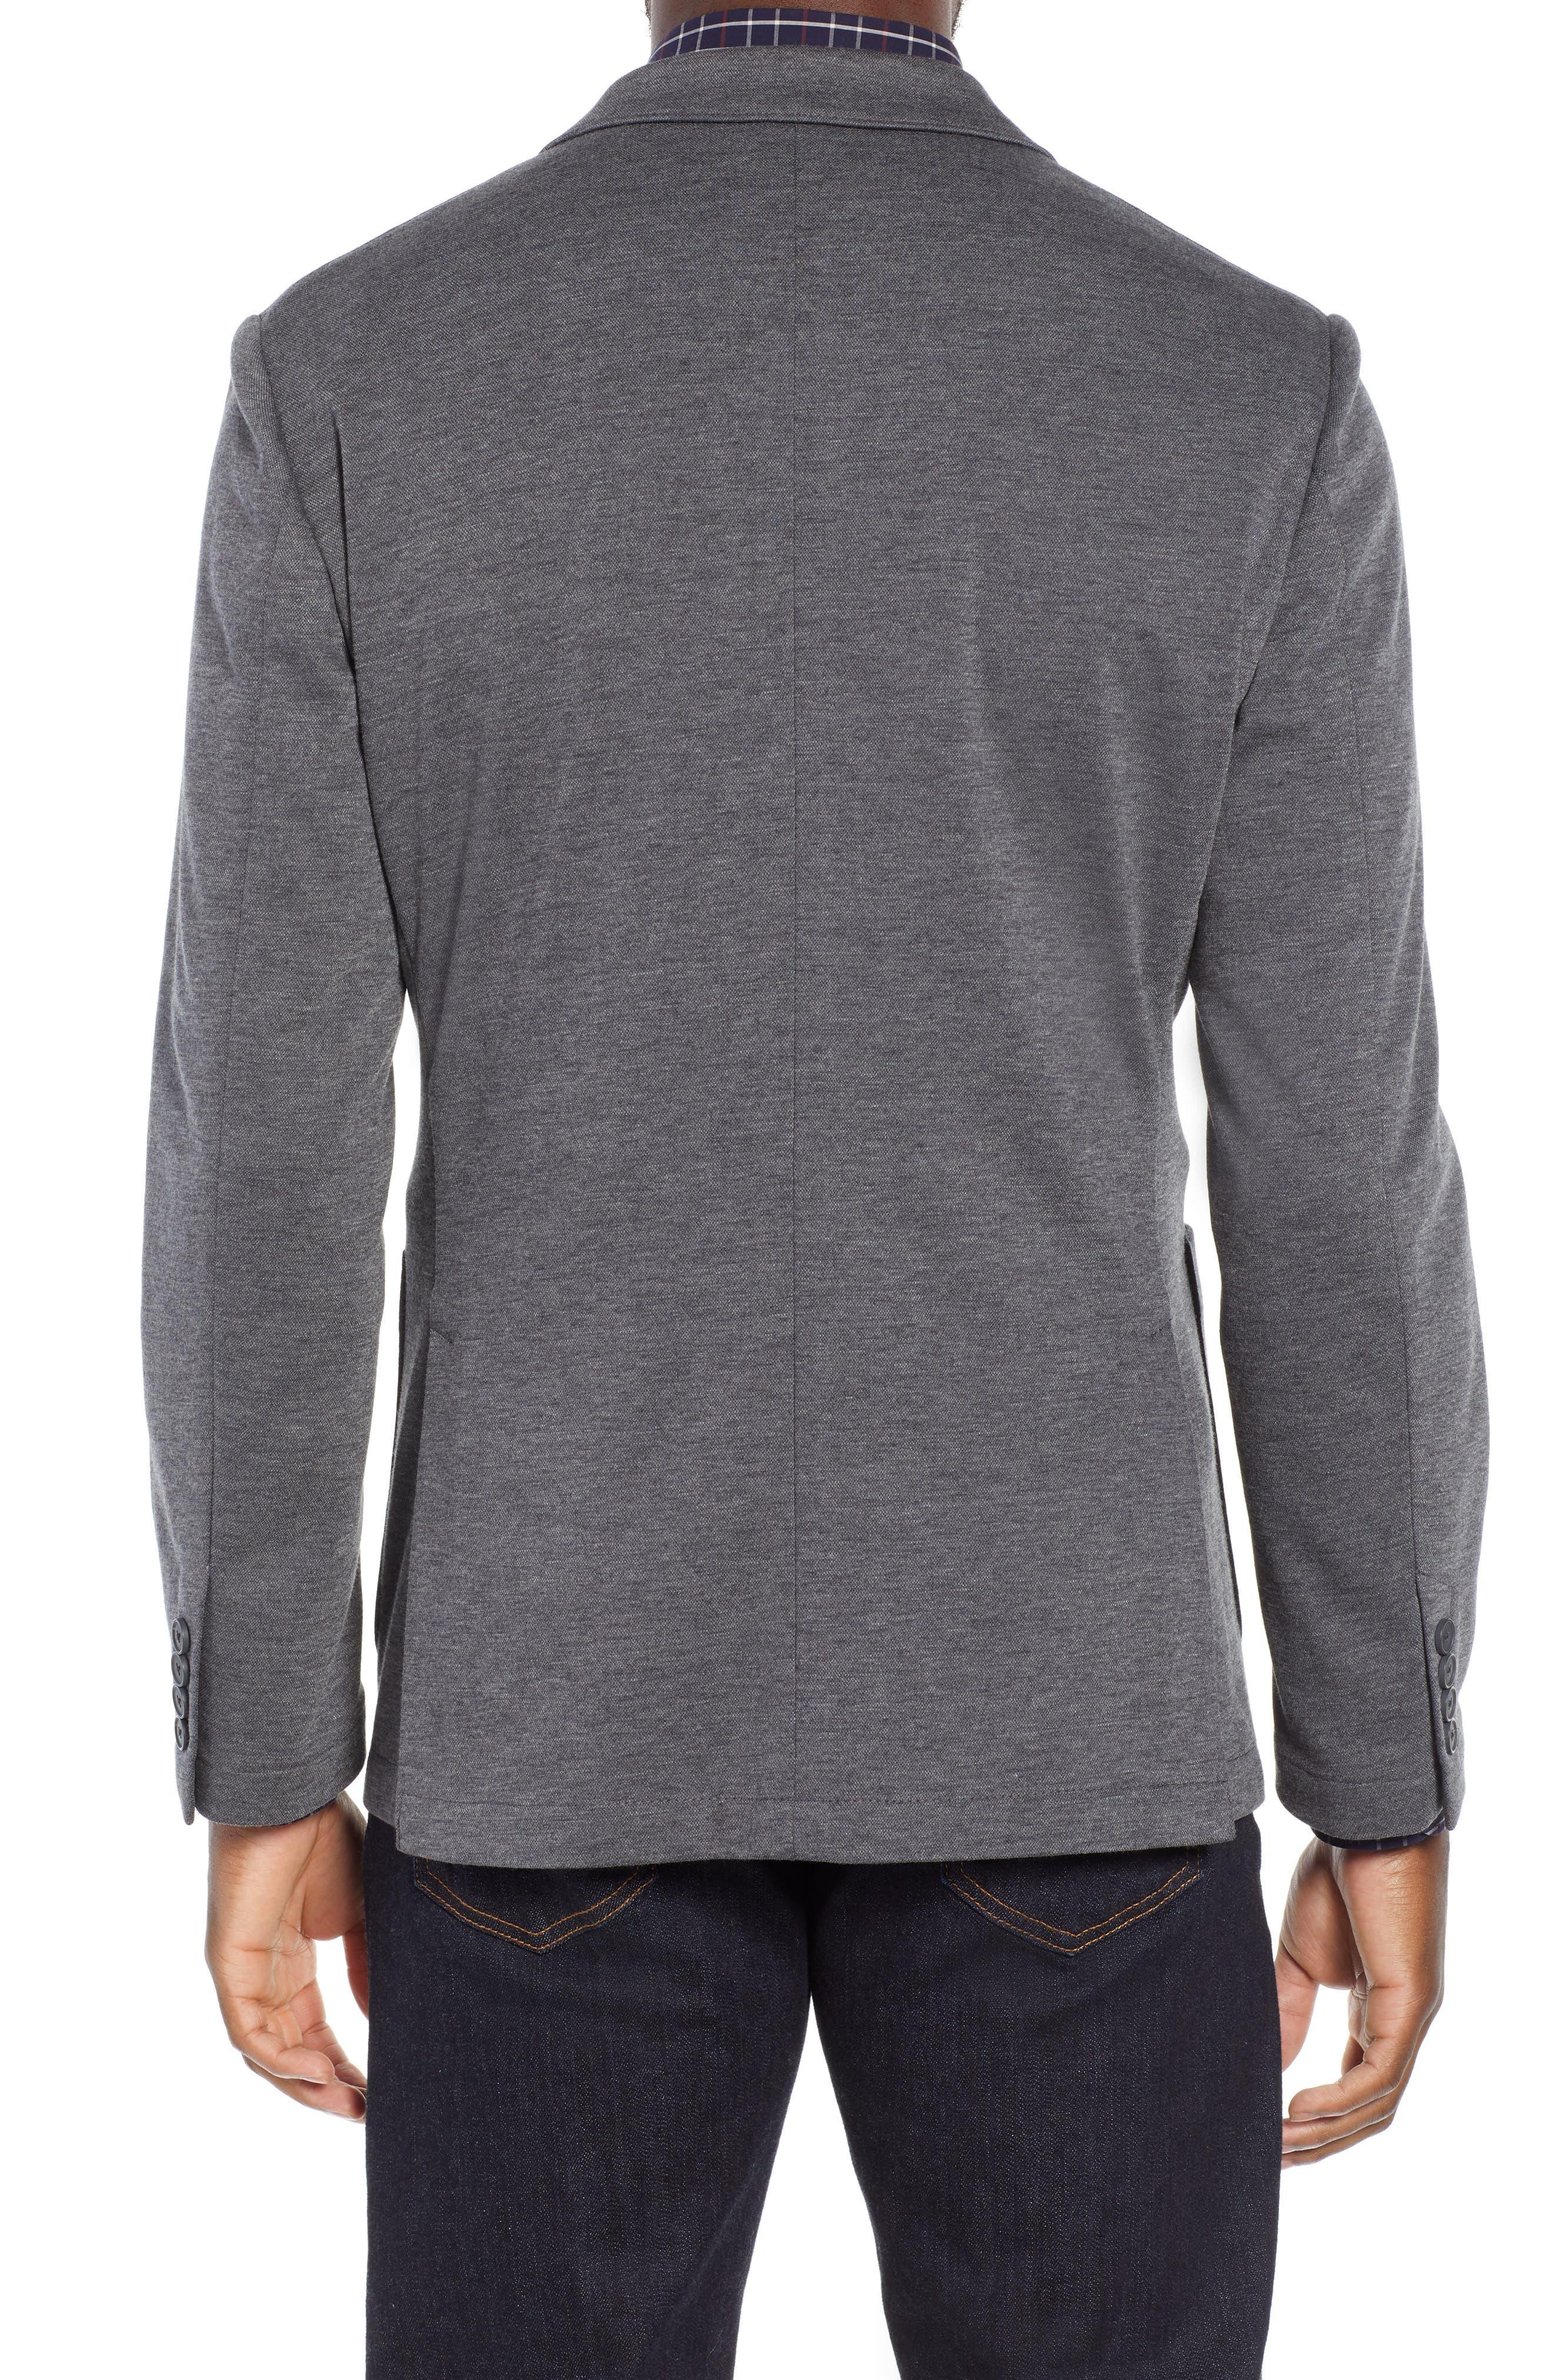 NORDSTROM MEN'S SHOP,                             Trim Fit Stretch Comfort Sport Coat,                             Alternate thumbnail 2, color,                             020